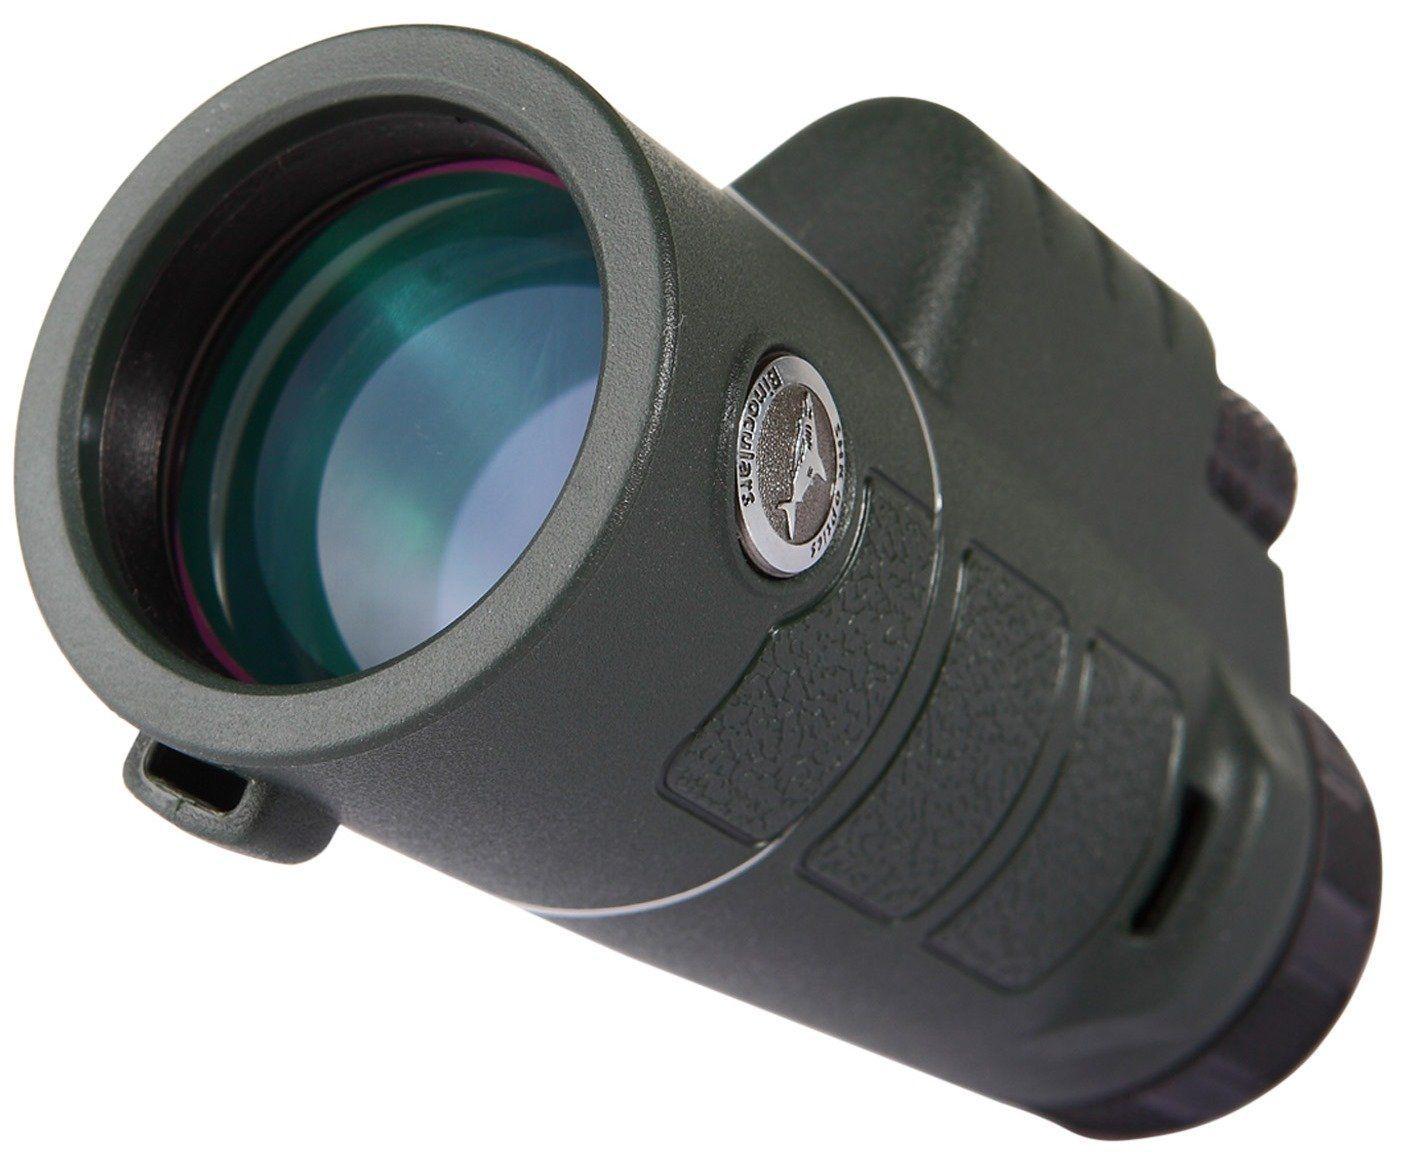 Ueasy waterproof fogproof monocular high definition mini